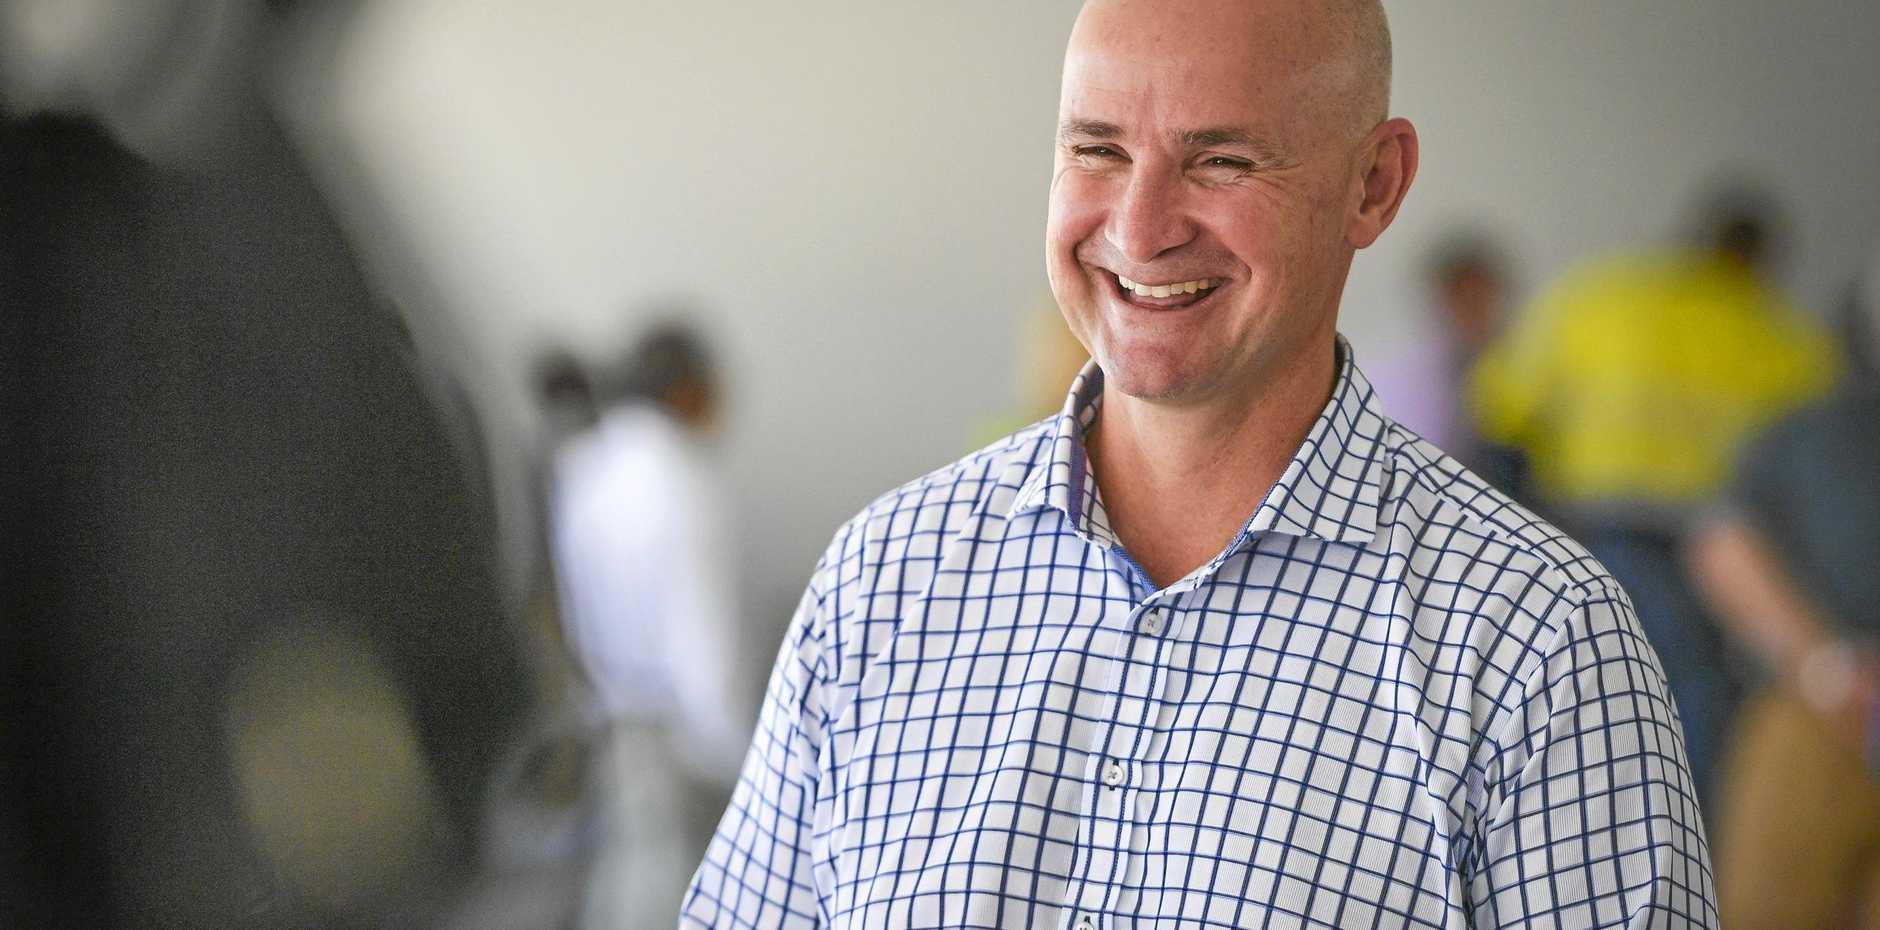 WAR OF THE WORDS: Glenn Butcher says Opposition Leader Deb Frecklington is